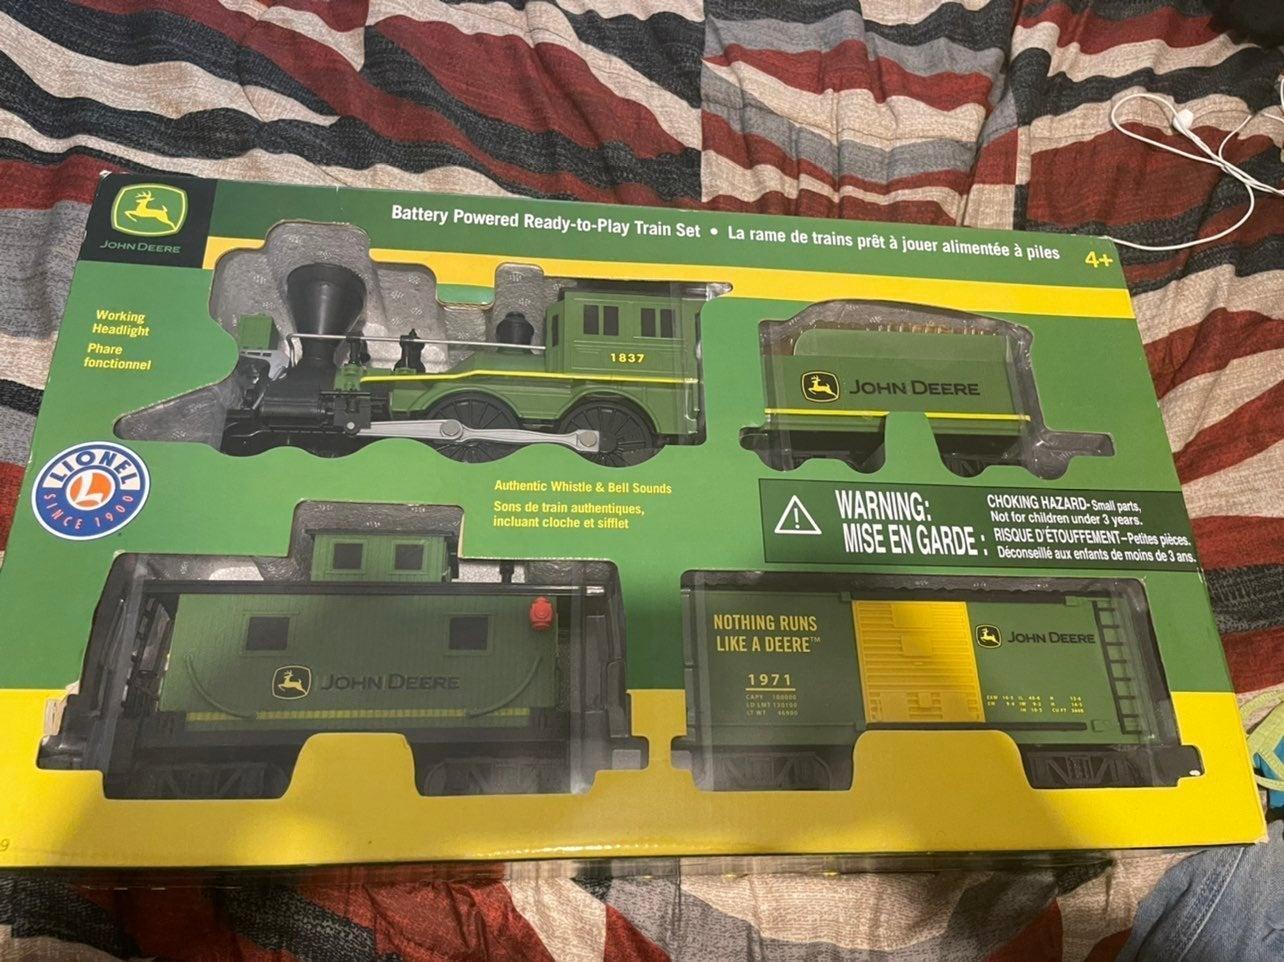 John deerre train set